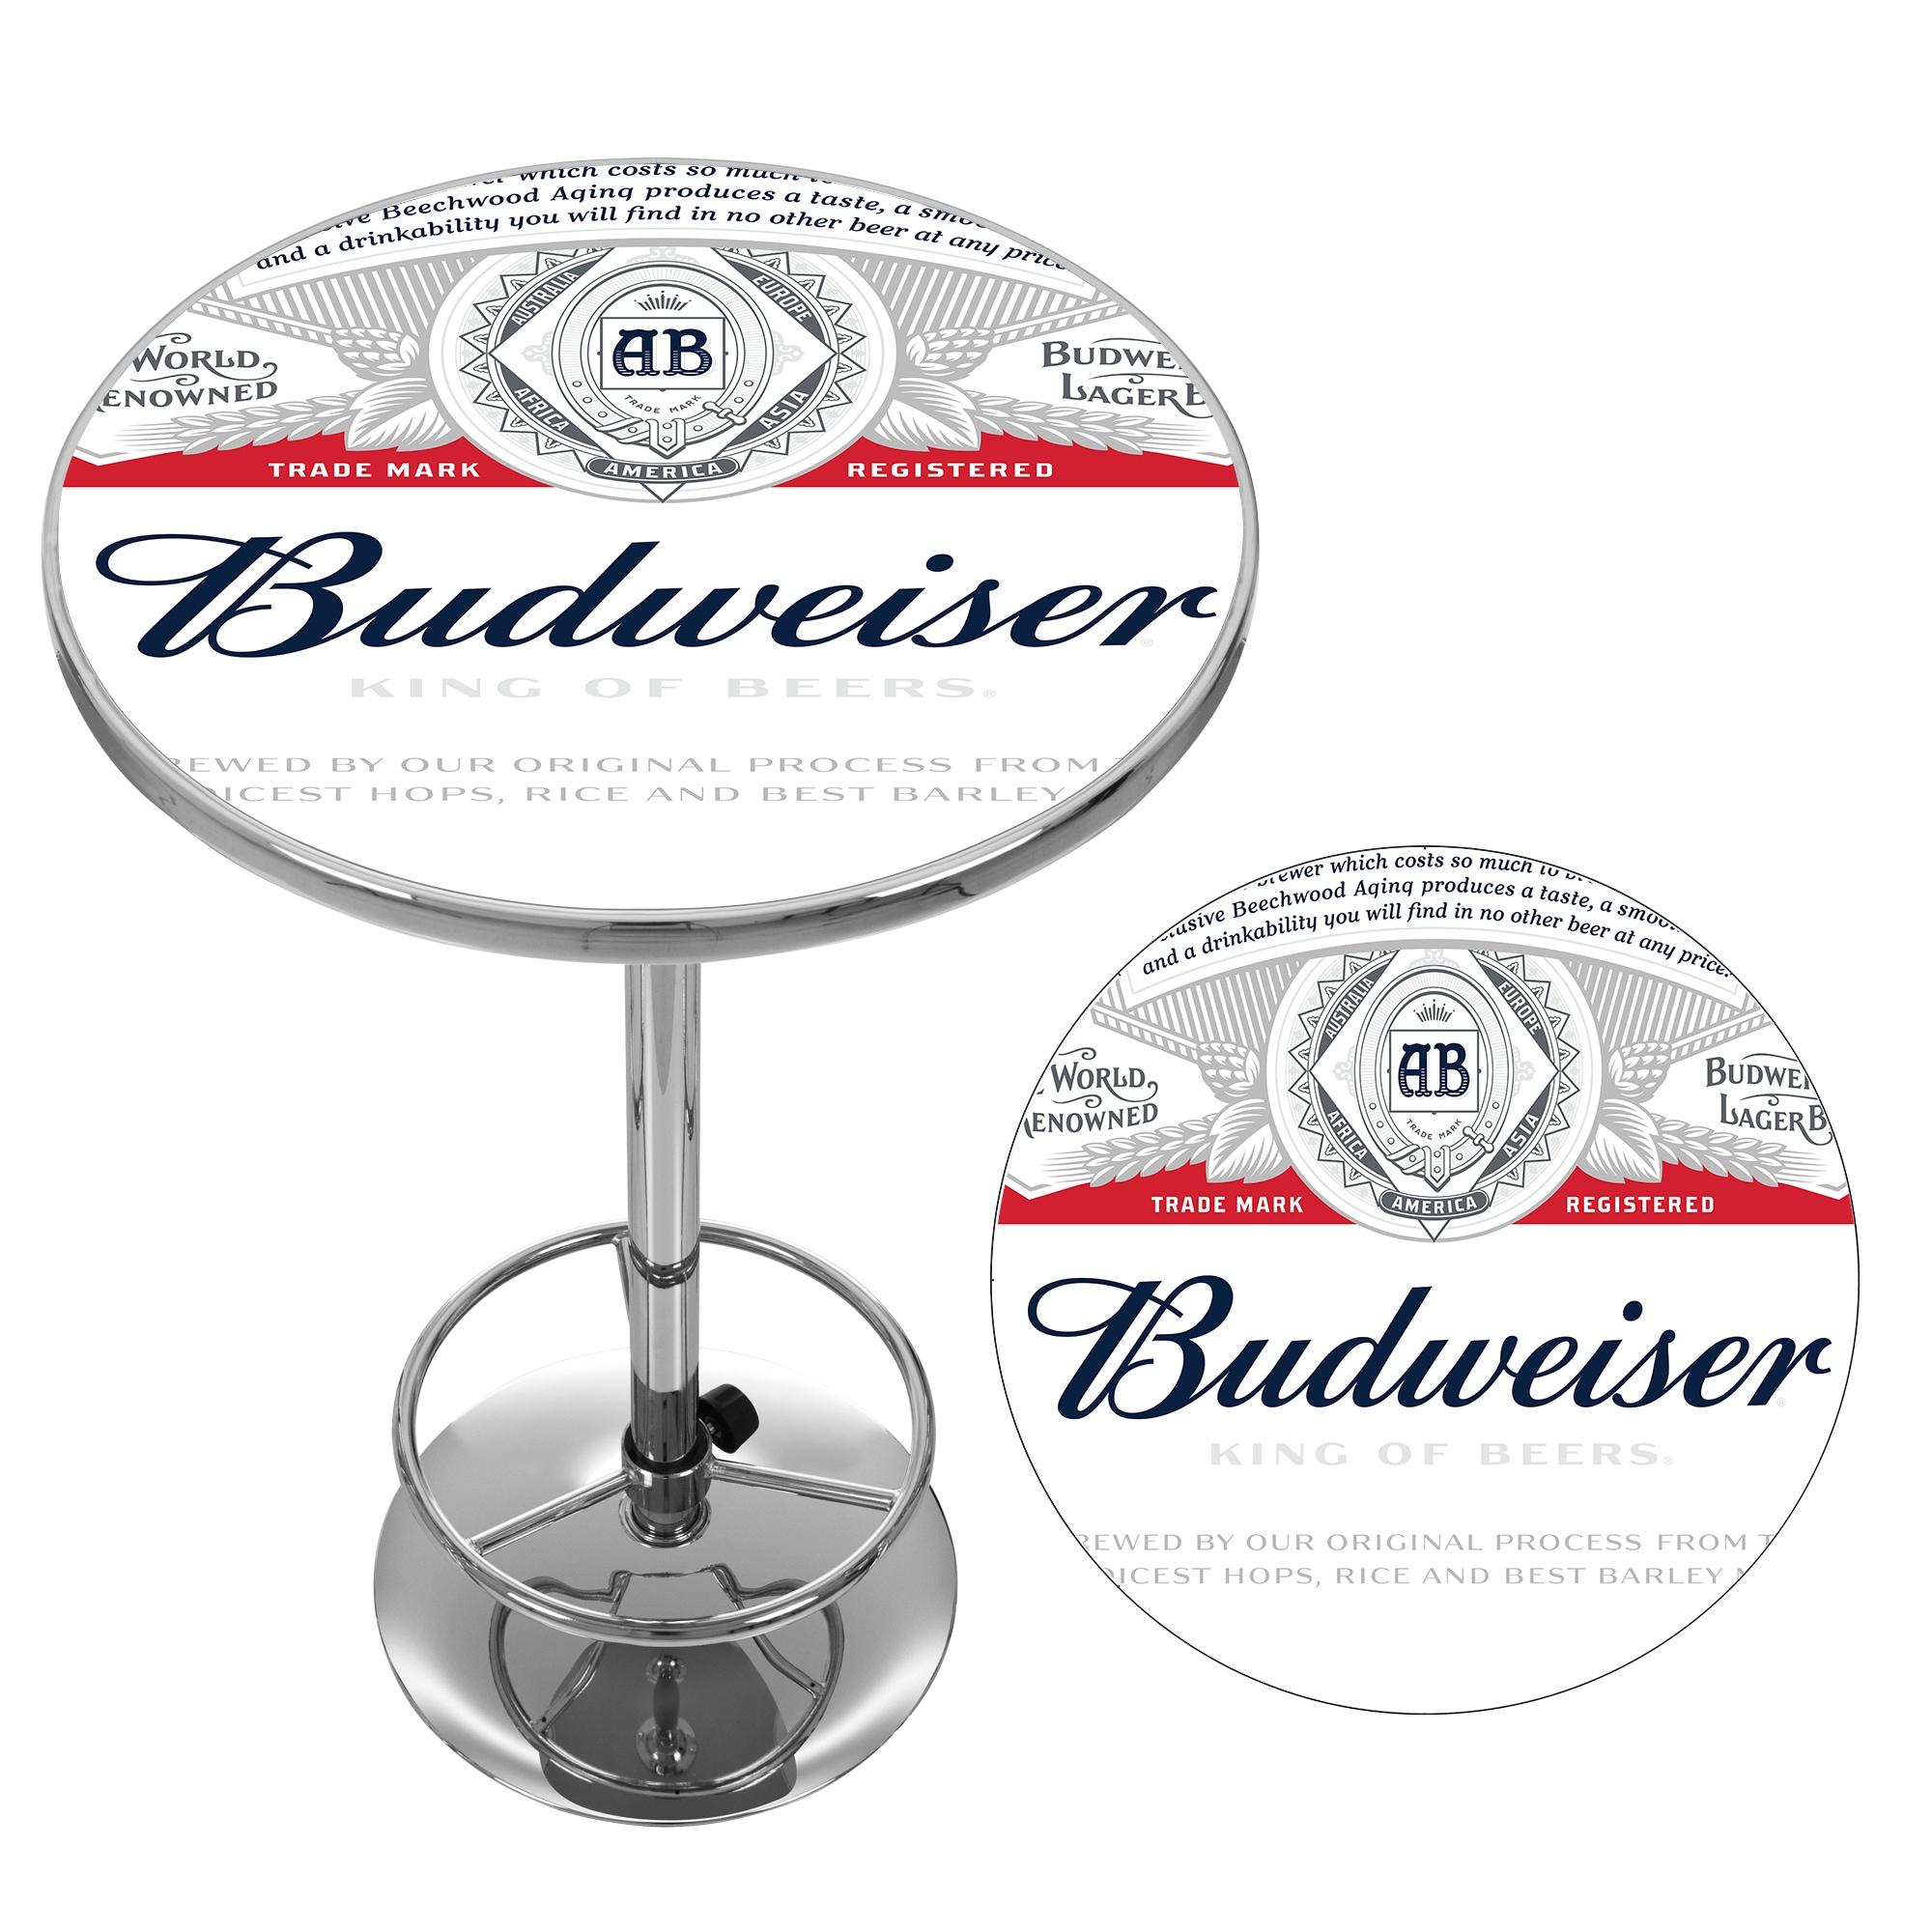 Shop budweiser chrome pub table label design on sale free shop budweiser chrome pub table label design on sale free shipping today overstock 10676755 watchthetrailerfo